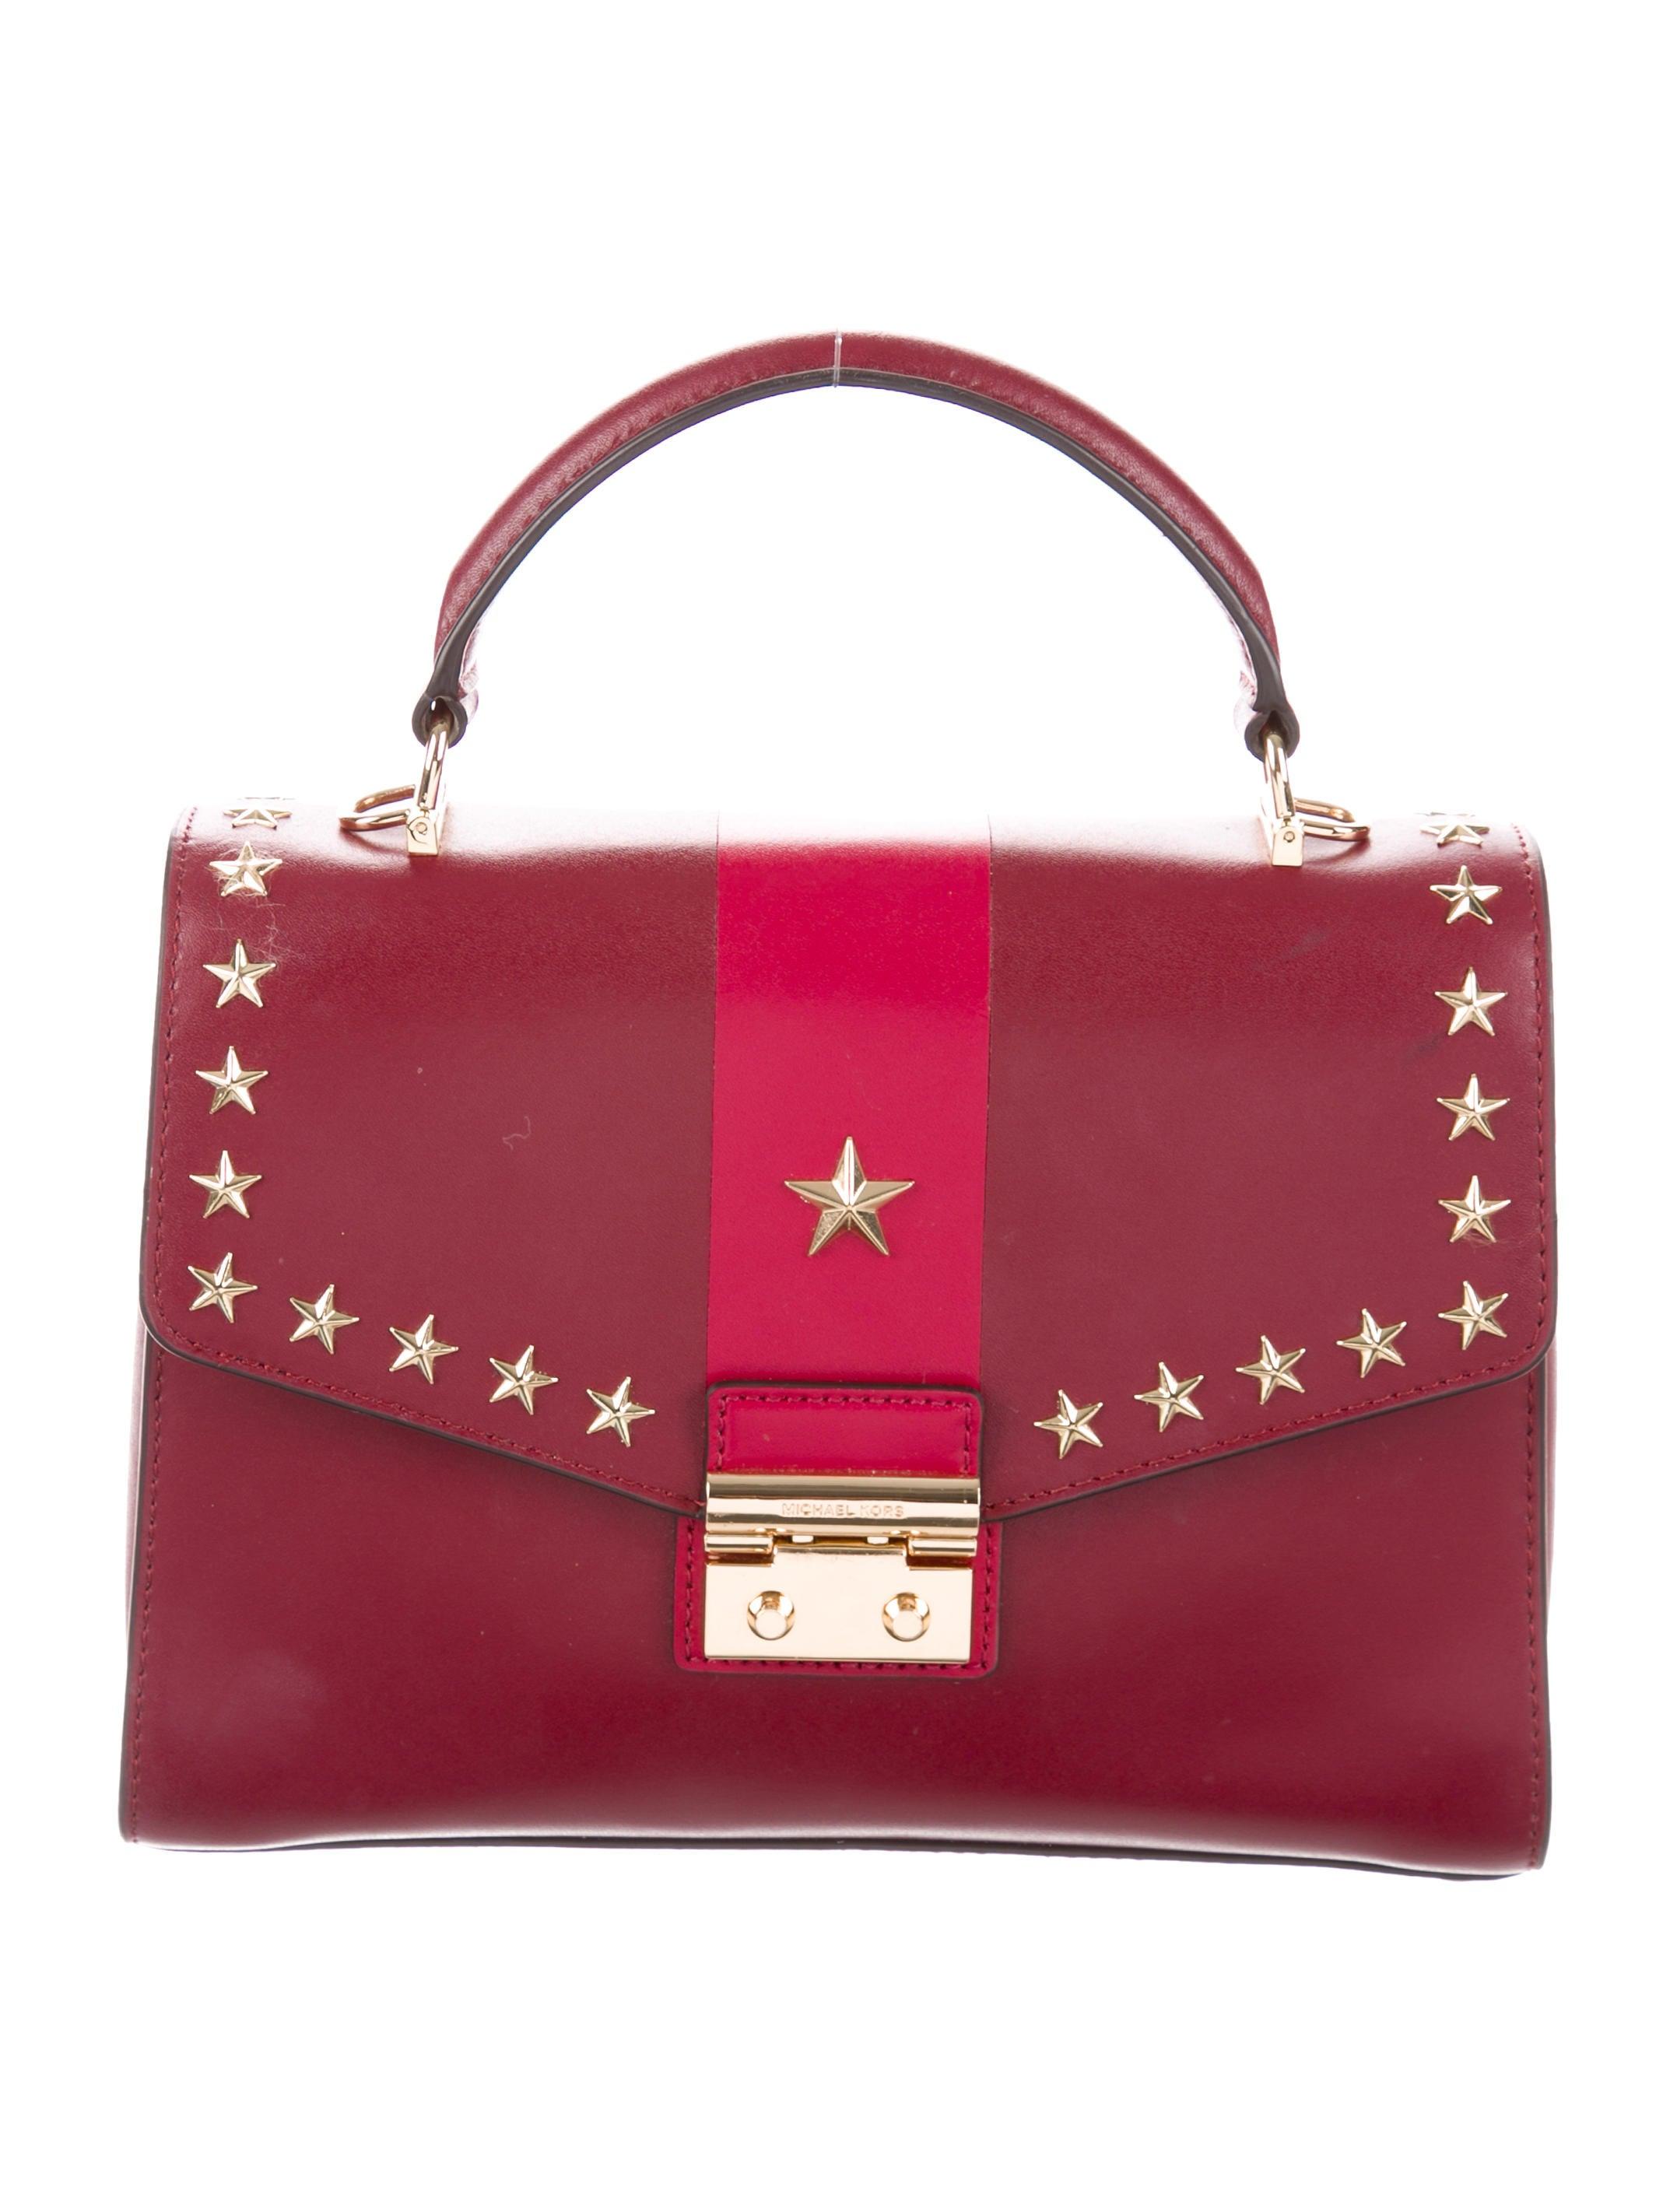 Michael Michael Kors Studded Handbag Handbags WM530576